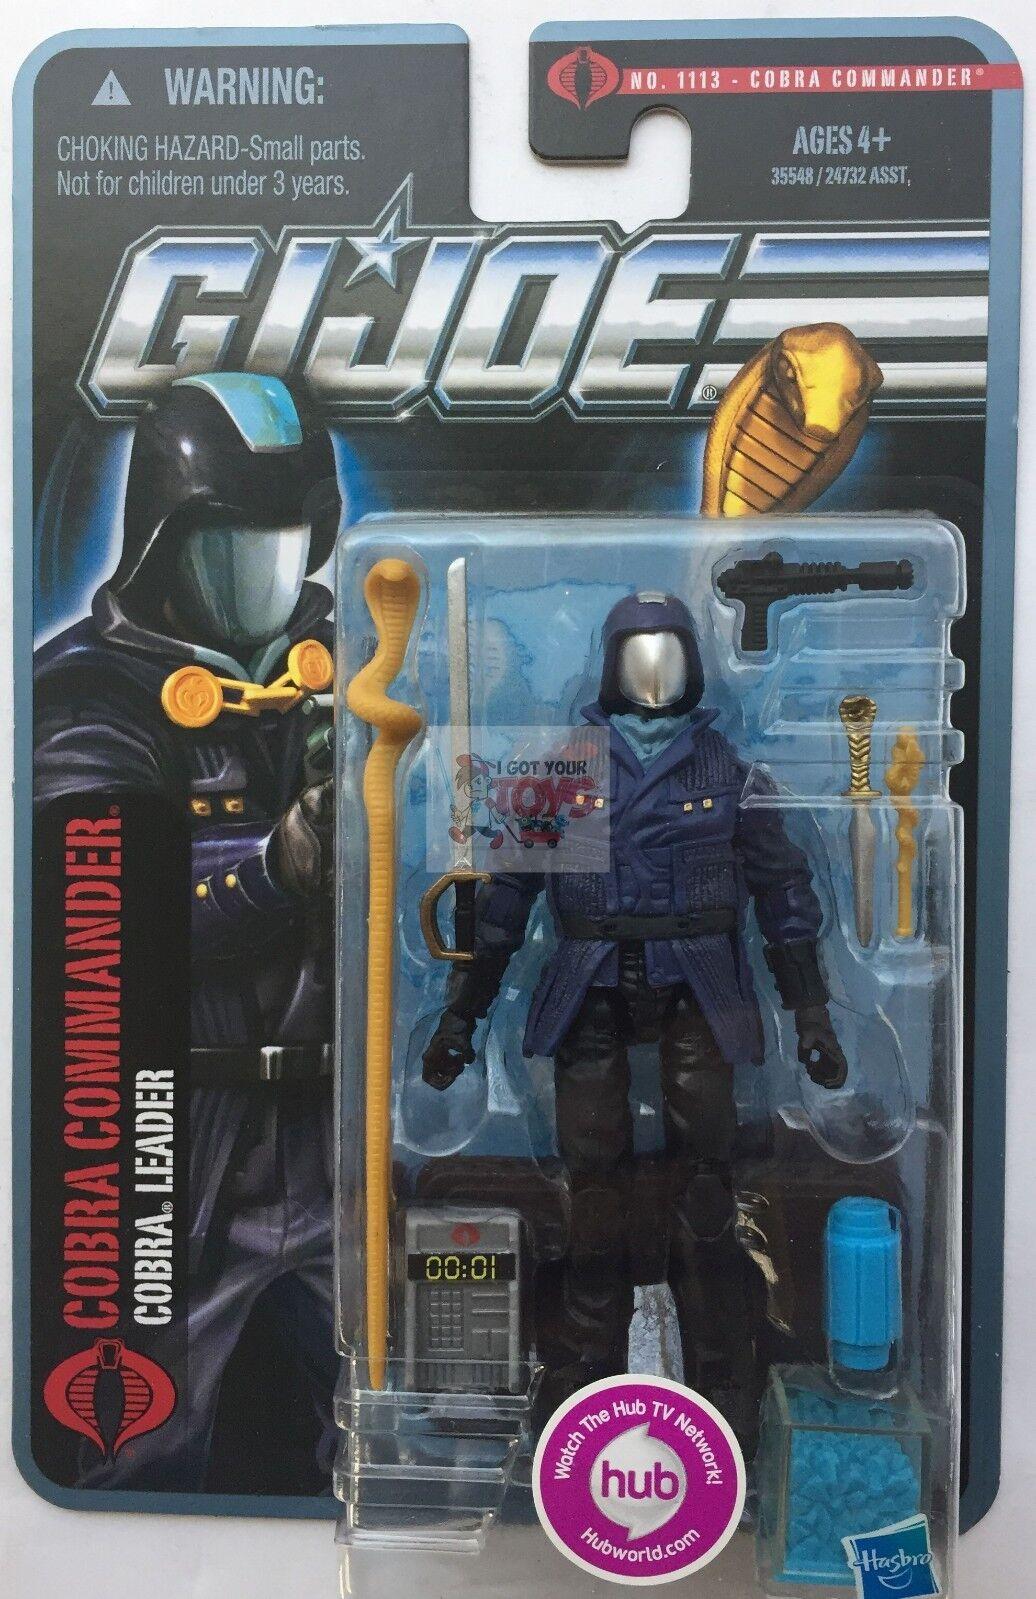 COBRA COMMANDER ARCTIC GI JOE The Pursuit Of Cobra 2010 3.75  Inch Action FIGURE